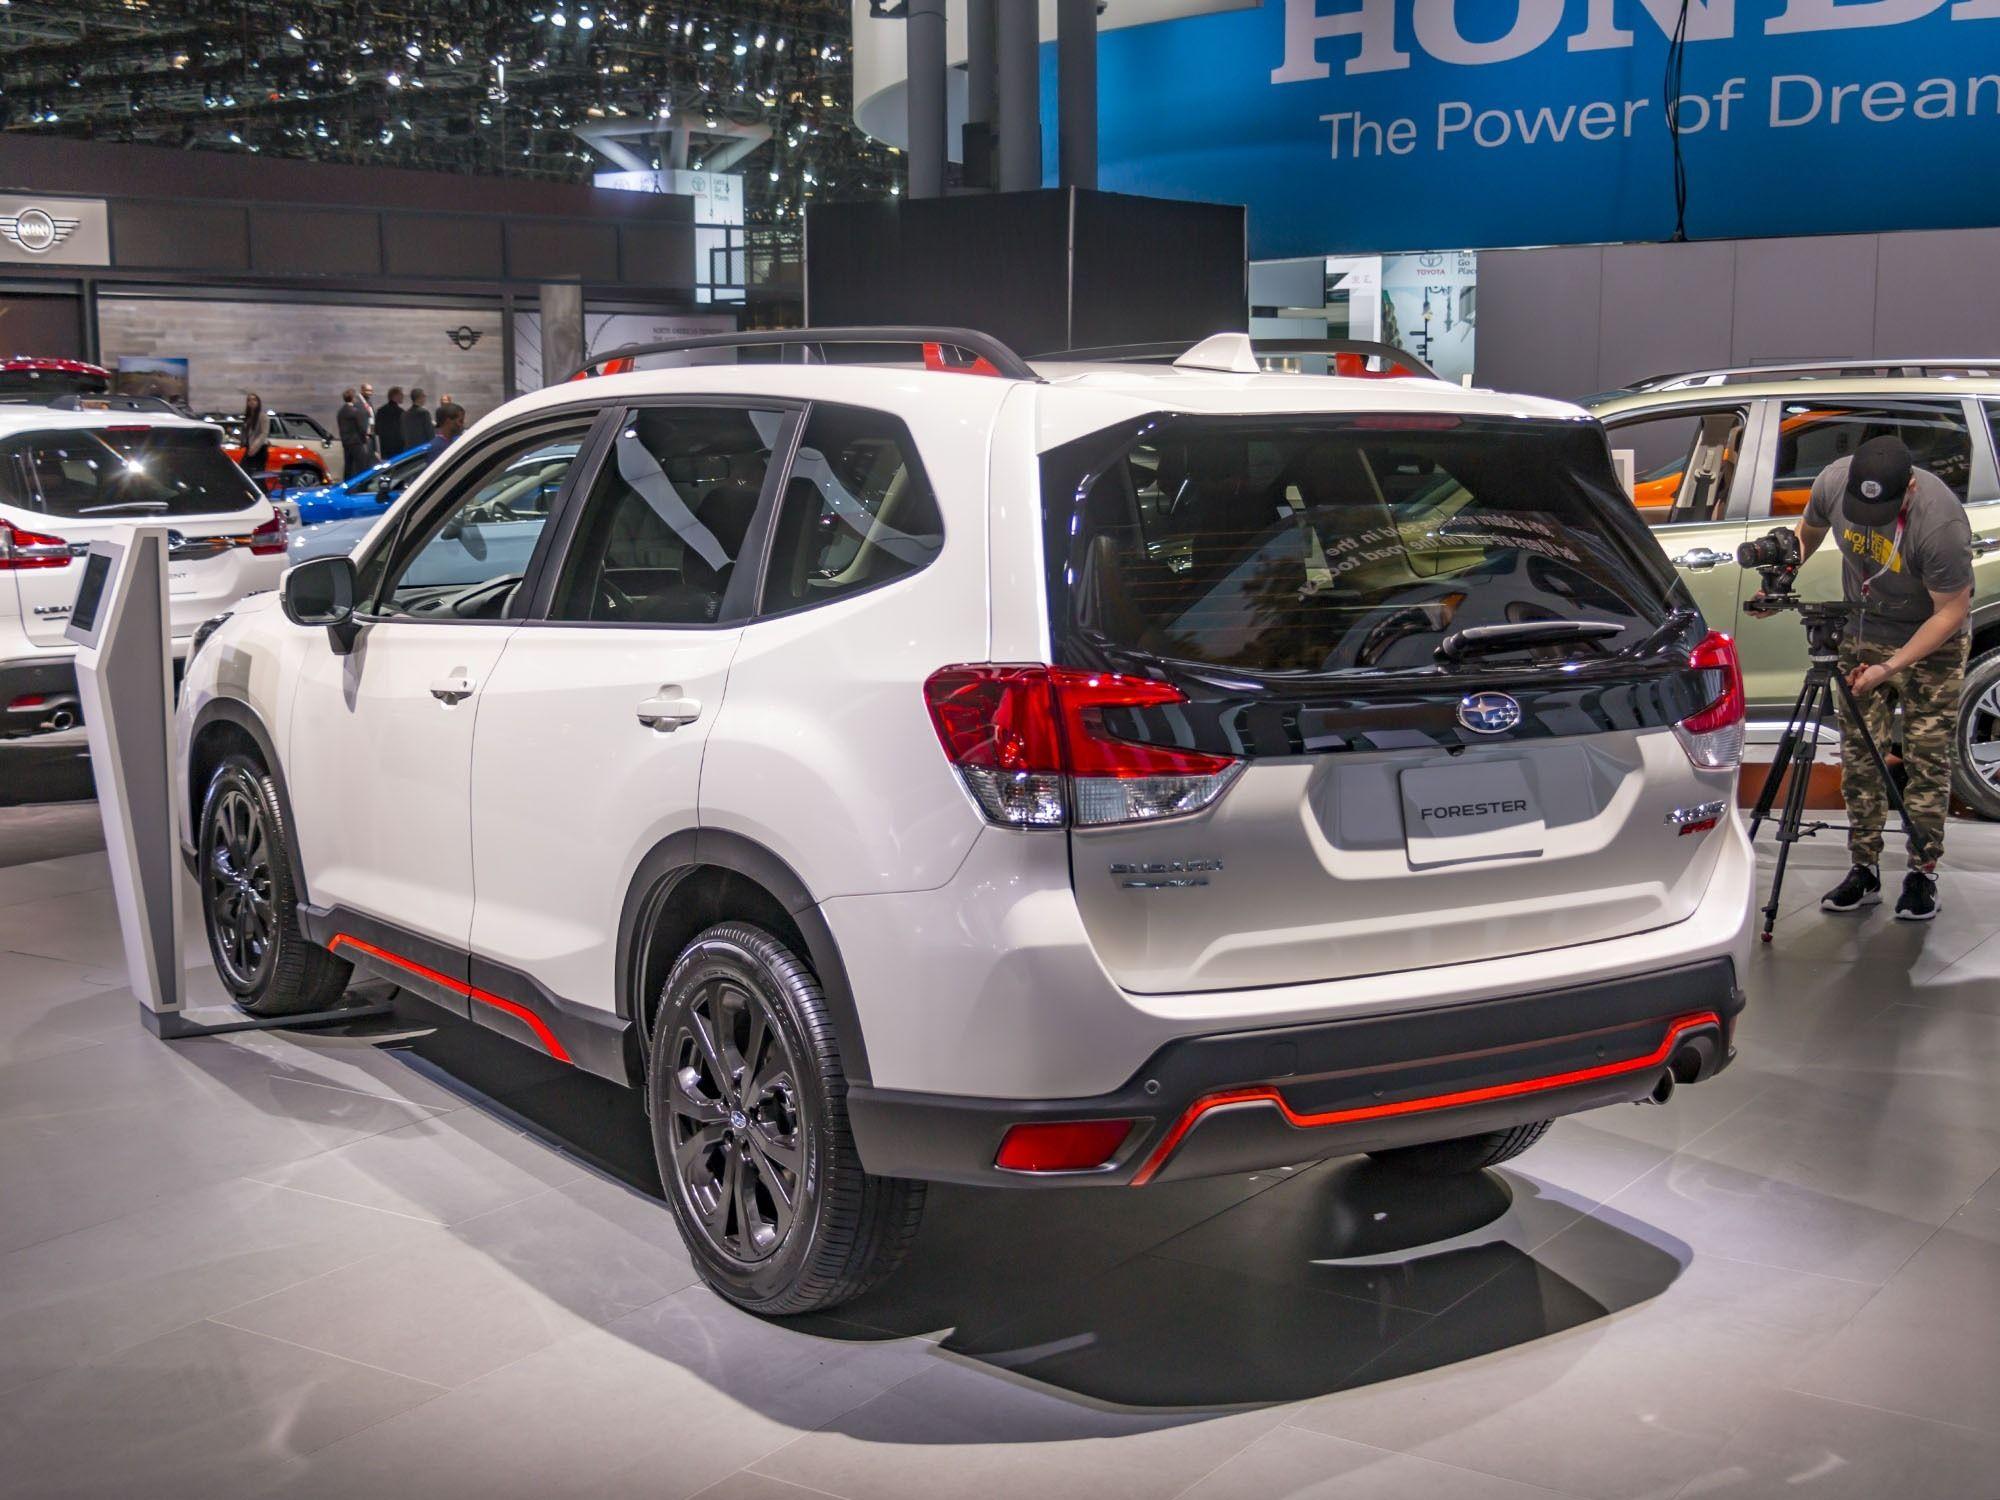 2019 Subaru Sports Redesign (With images) Subaru